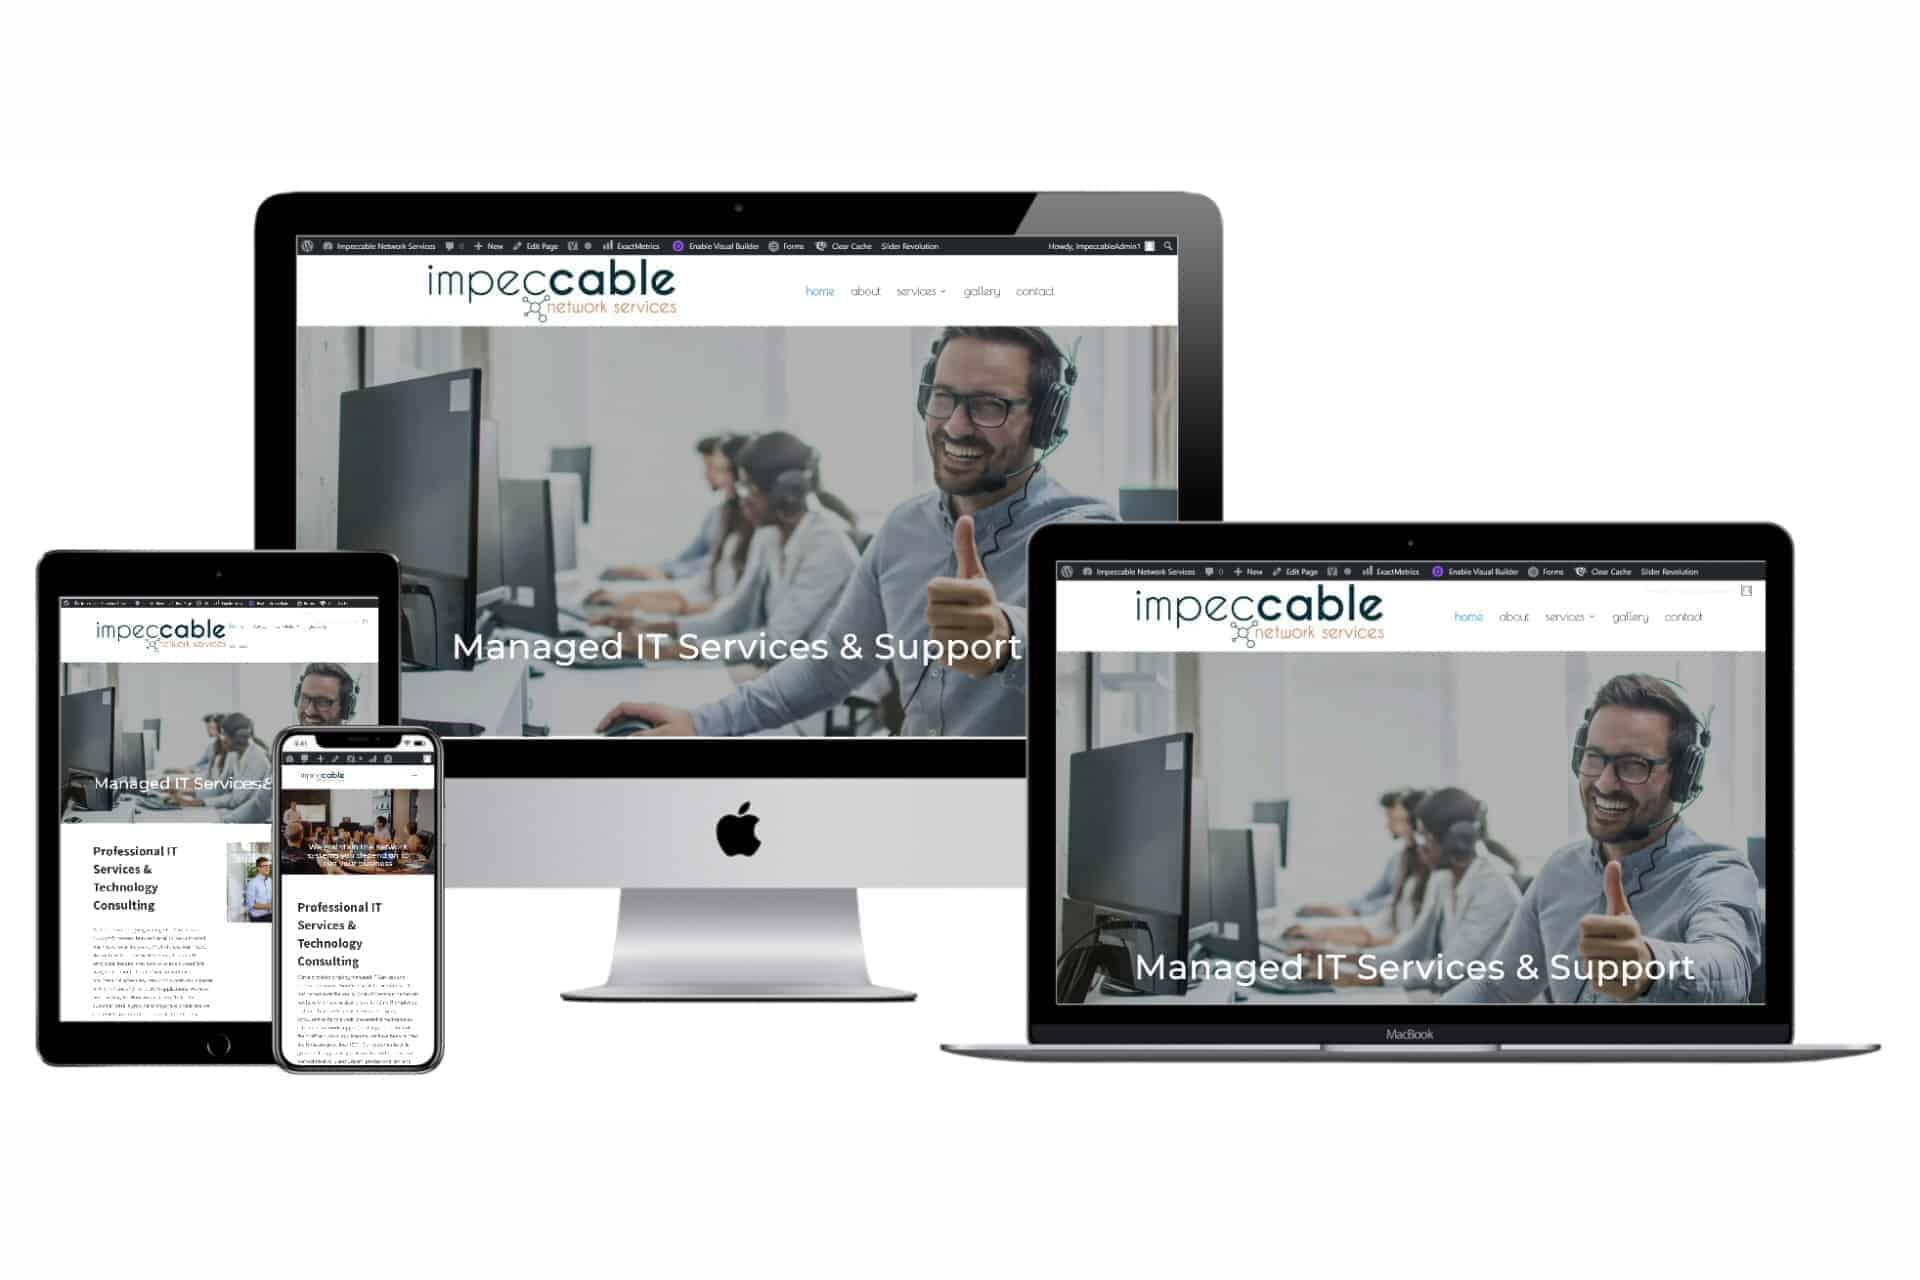 Impeccable Network Services New 2020 Responsive Website Design